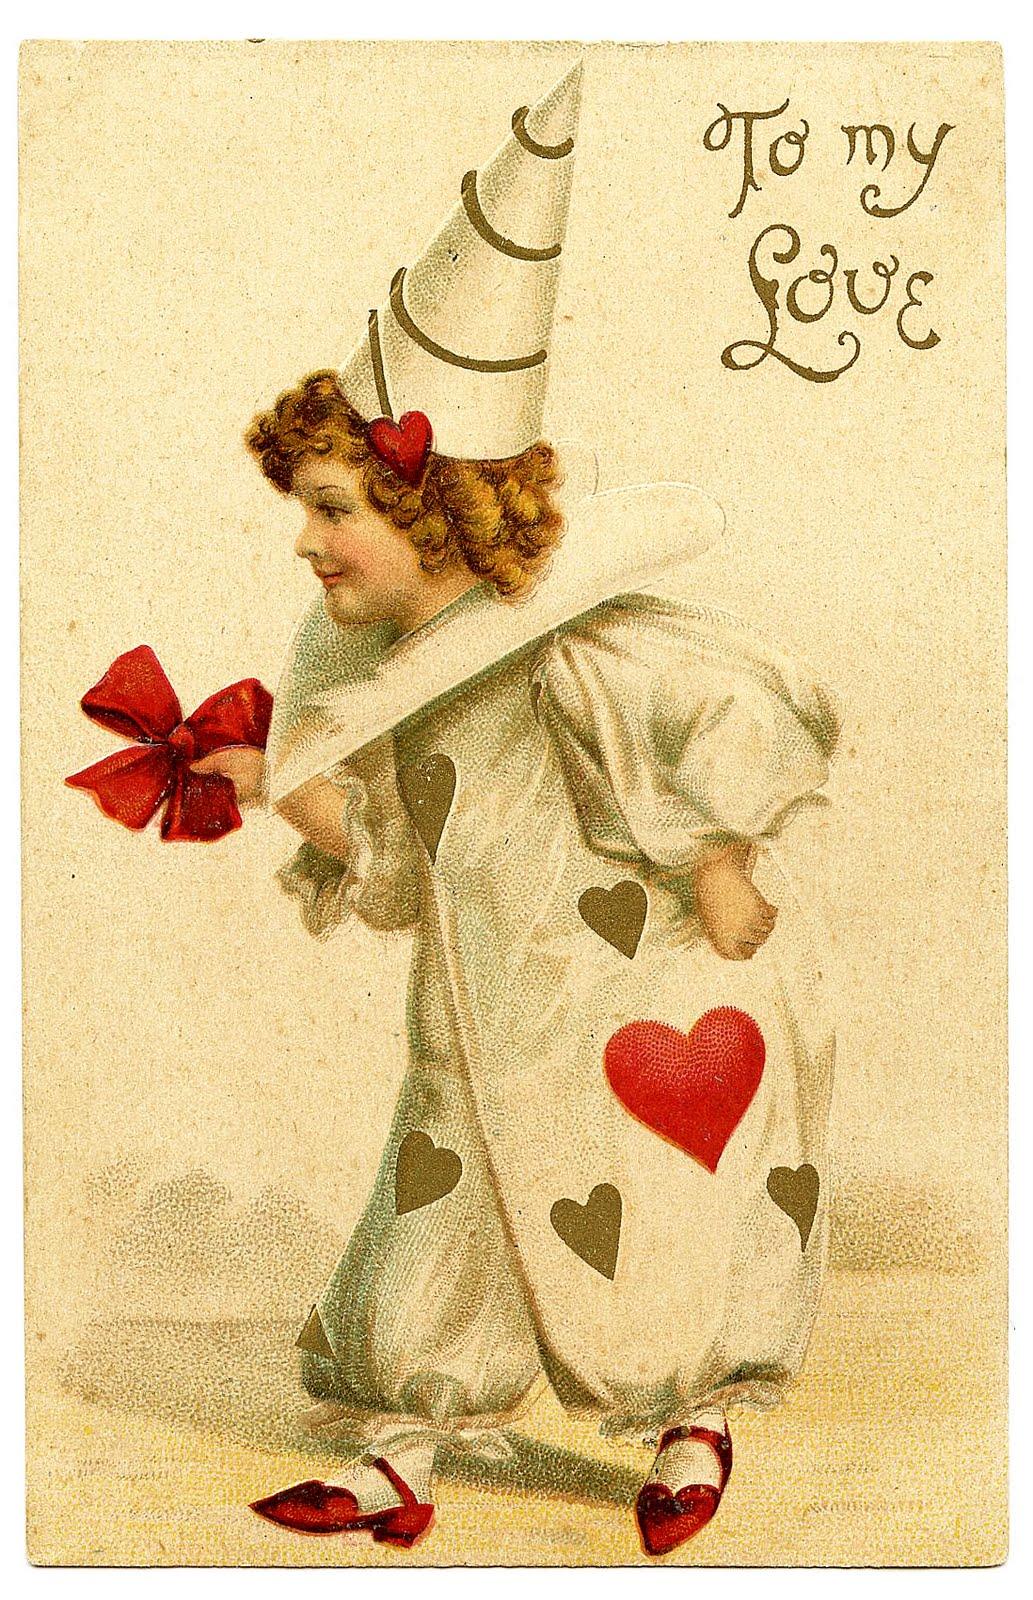 Vintage Valentine's Day Clip Art - Darling Clown Girl ...